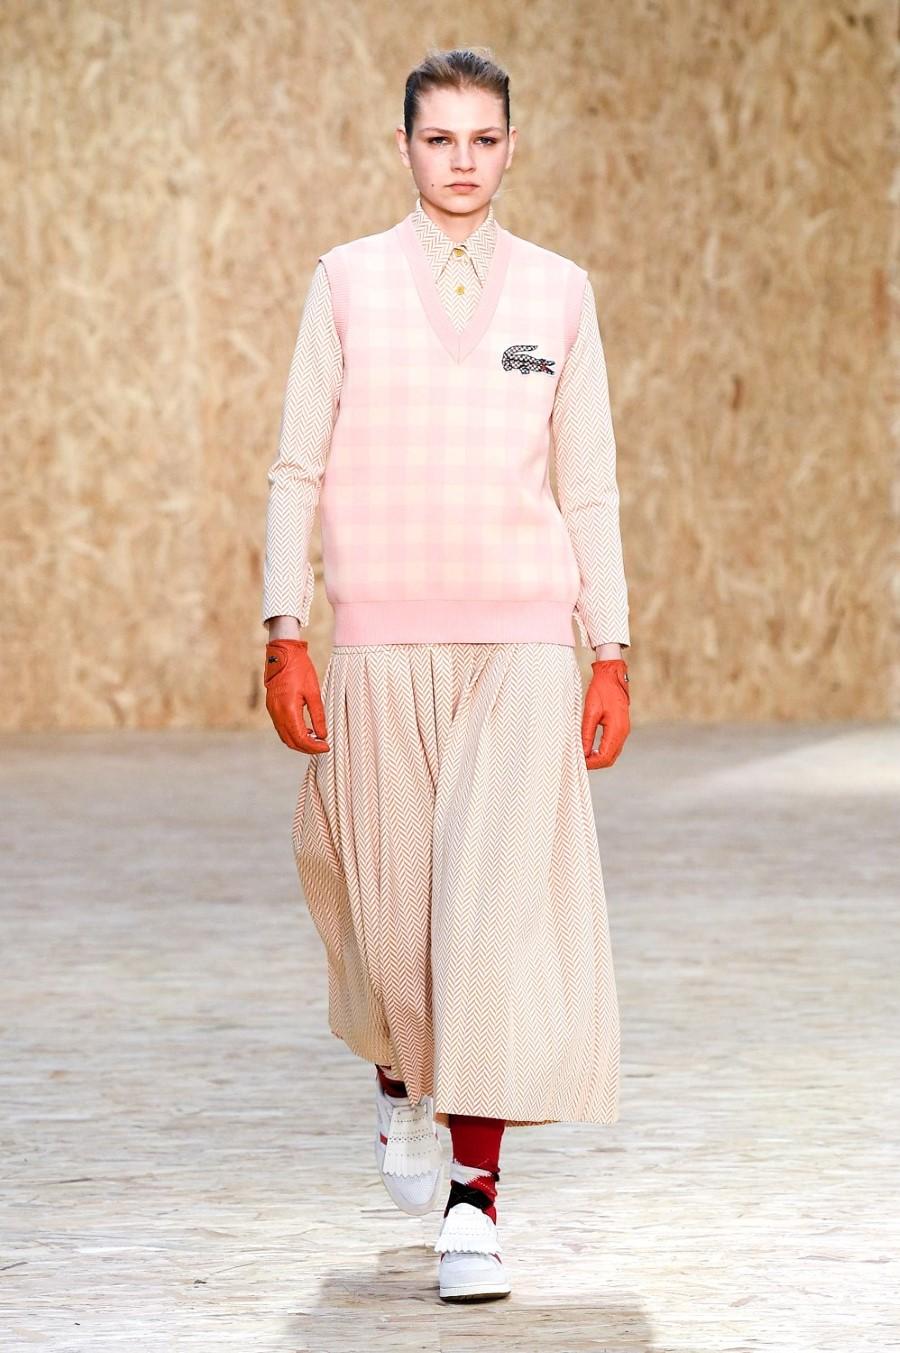 Lacoste - Fall Winter 2020 - Paris Fashion Week